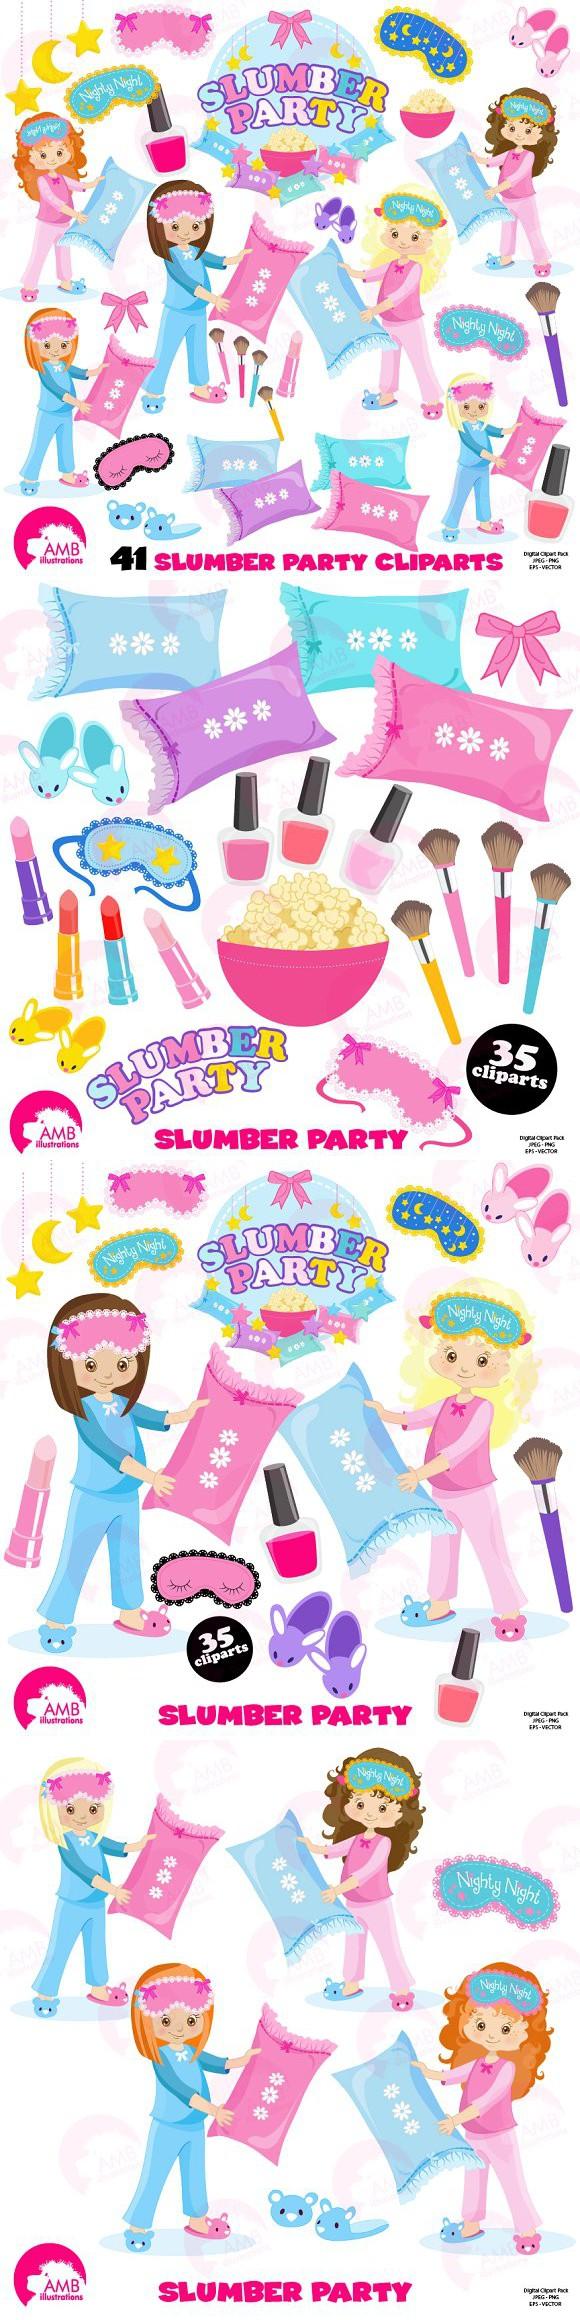 Slumber Party Clipart AMB-1234. Wedding Card Templates